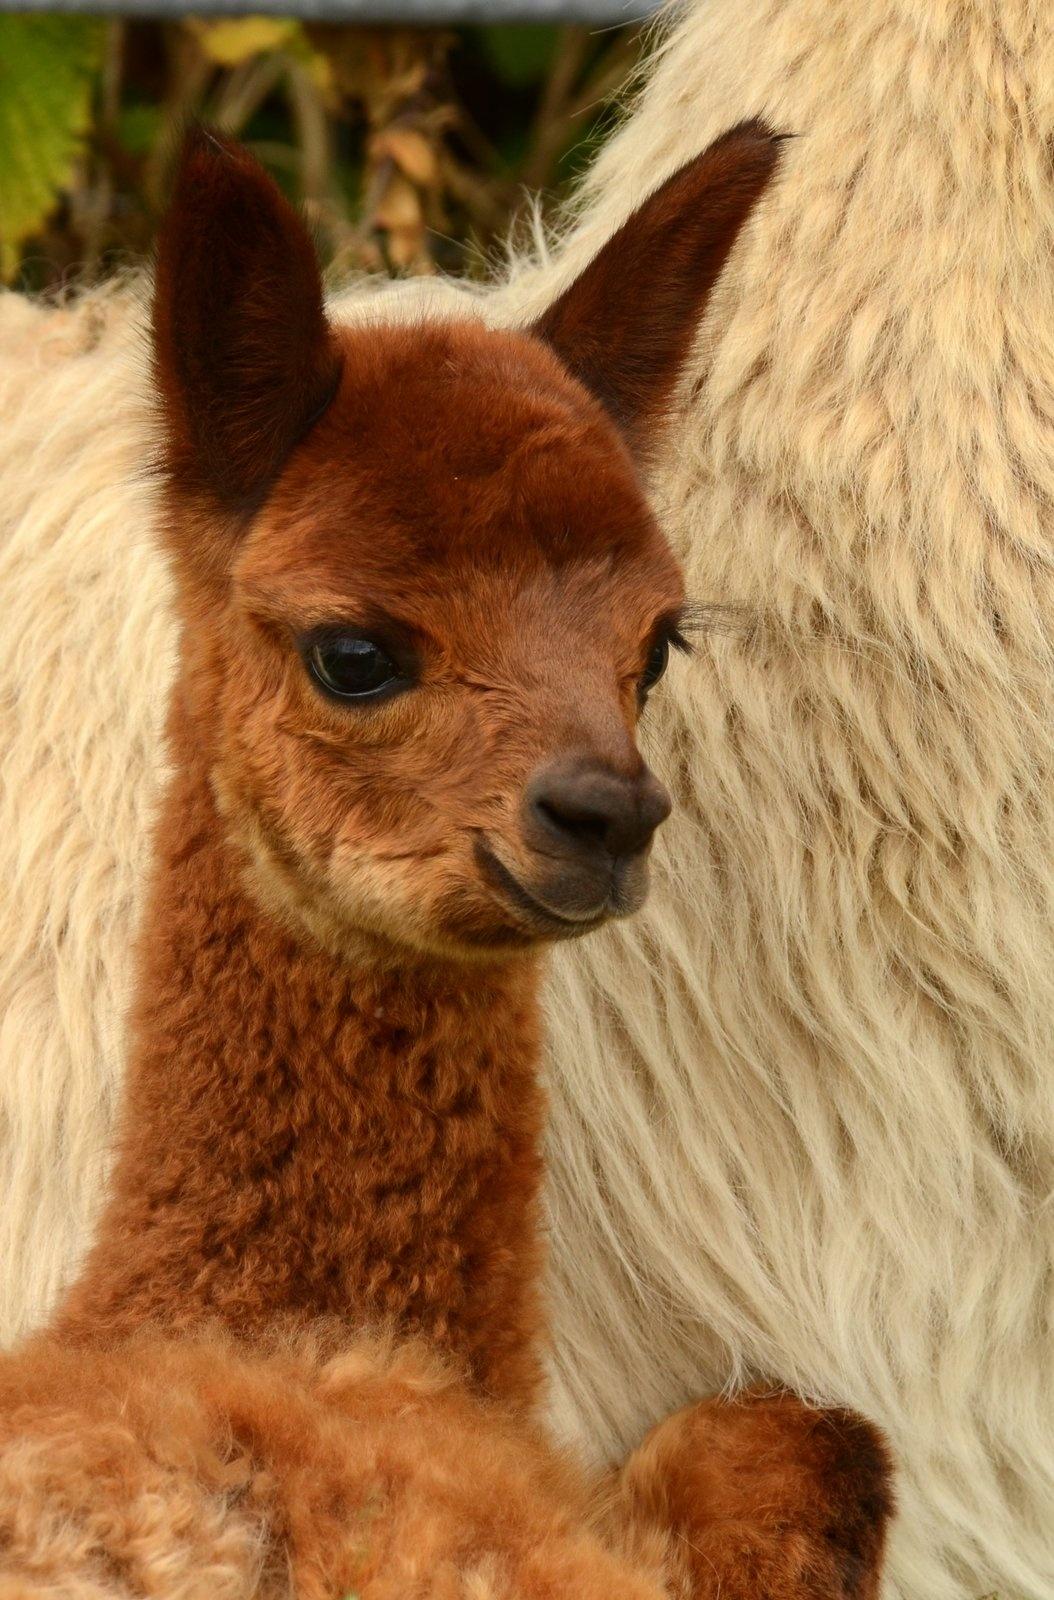 Baby Lama by jeffdixon